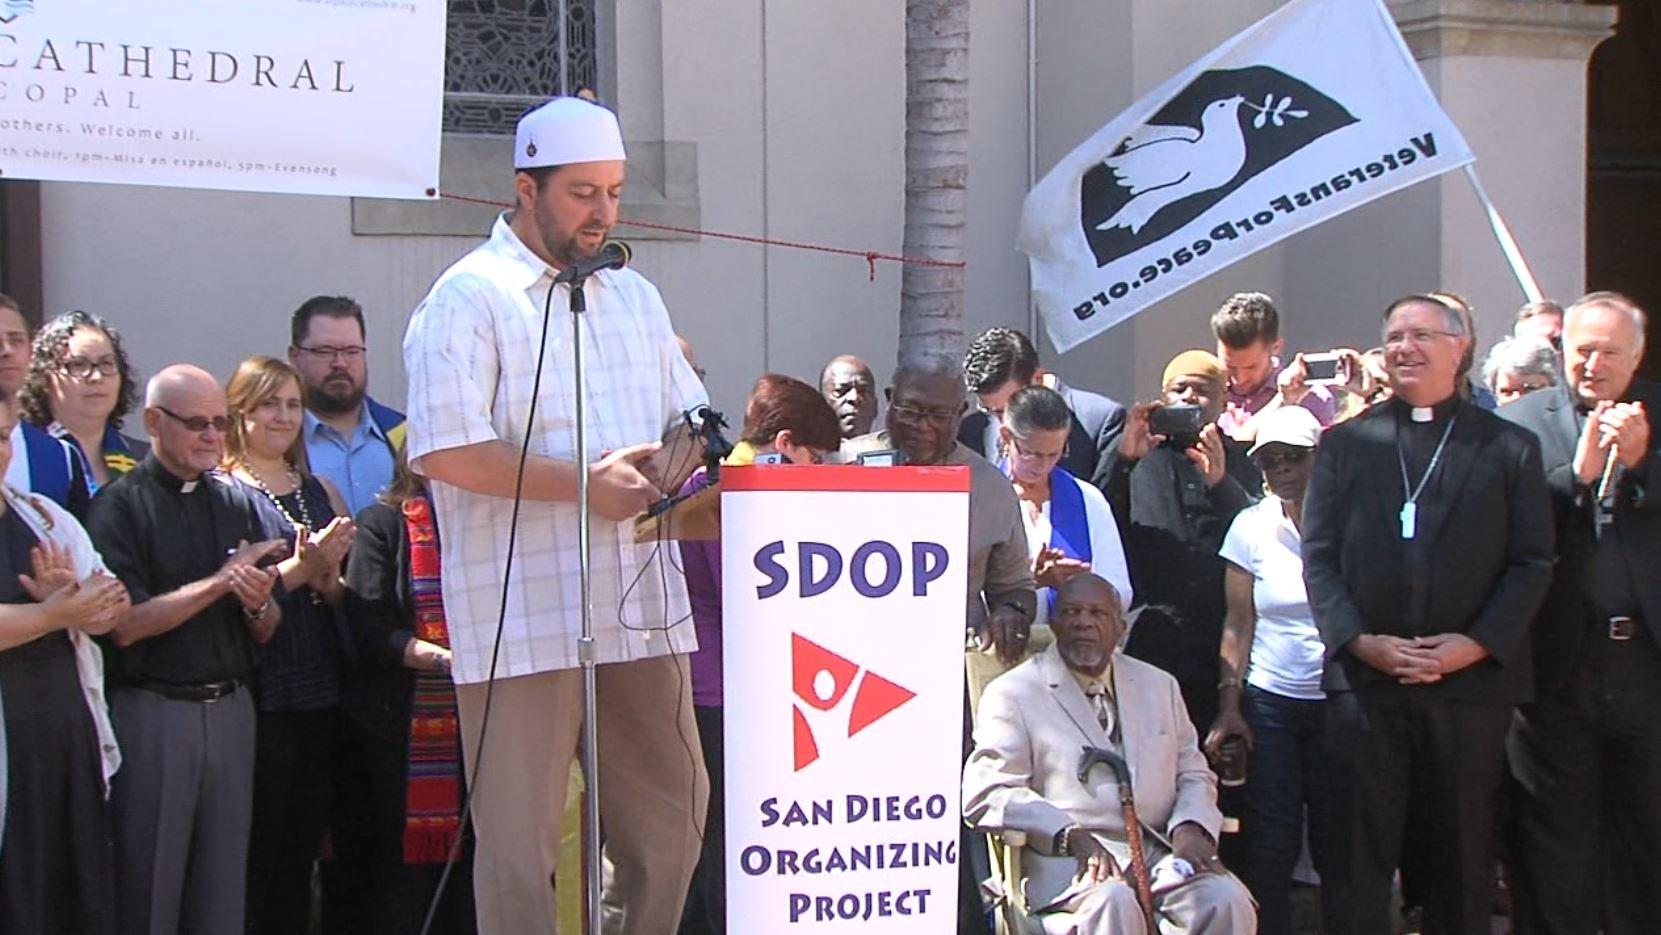 San Diego faith leaders denounce white supremacist groups